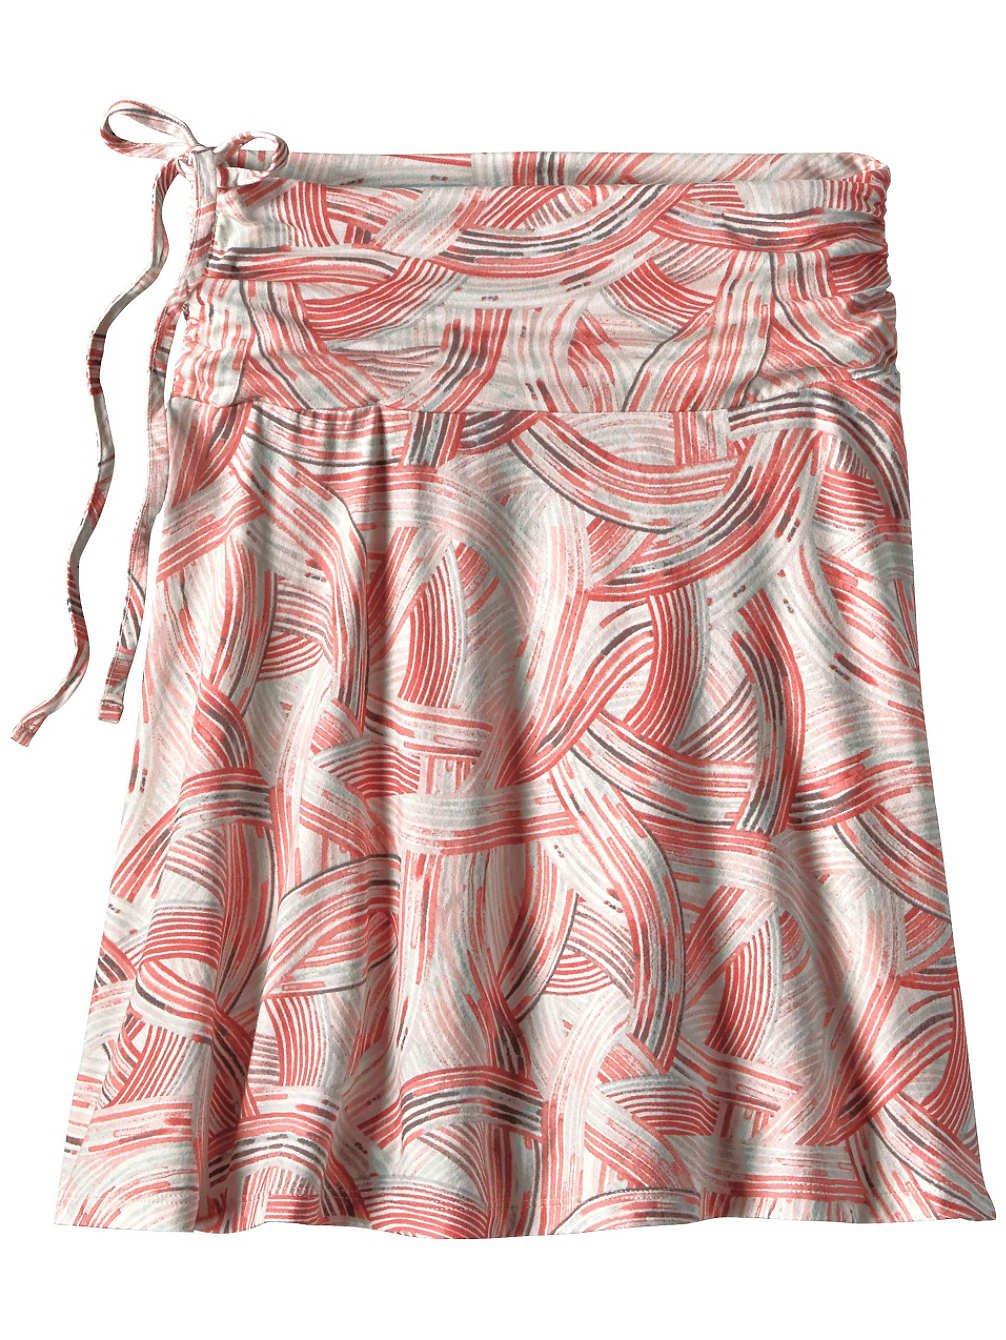 Patagonia Lithia Women's Skirt 58651